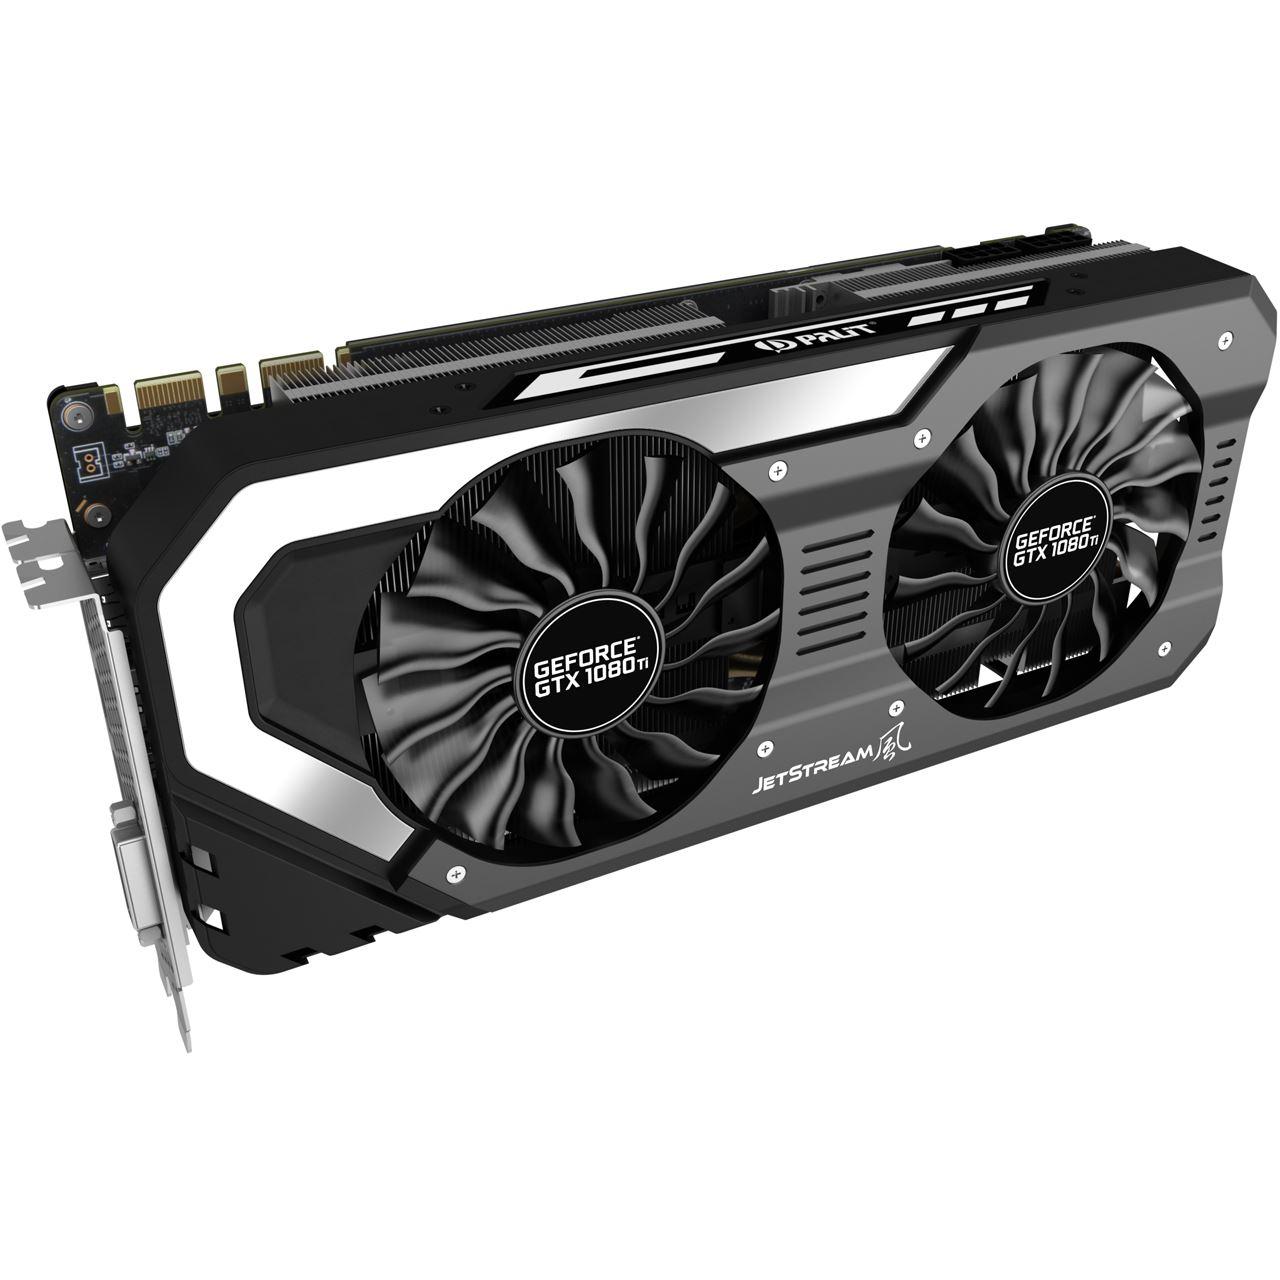 11GB Palit GeForce GTX 1080 Ti JetStream Aktiv PCIe 3.0 x16 (Retail) (Mindfactory(Mindstar))